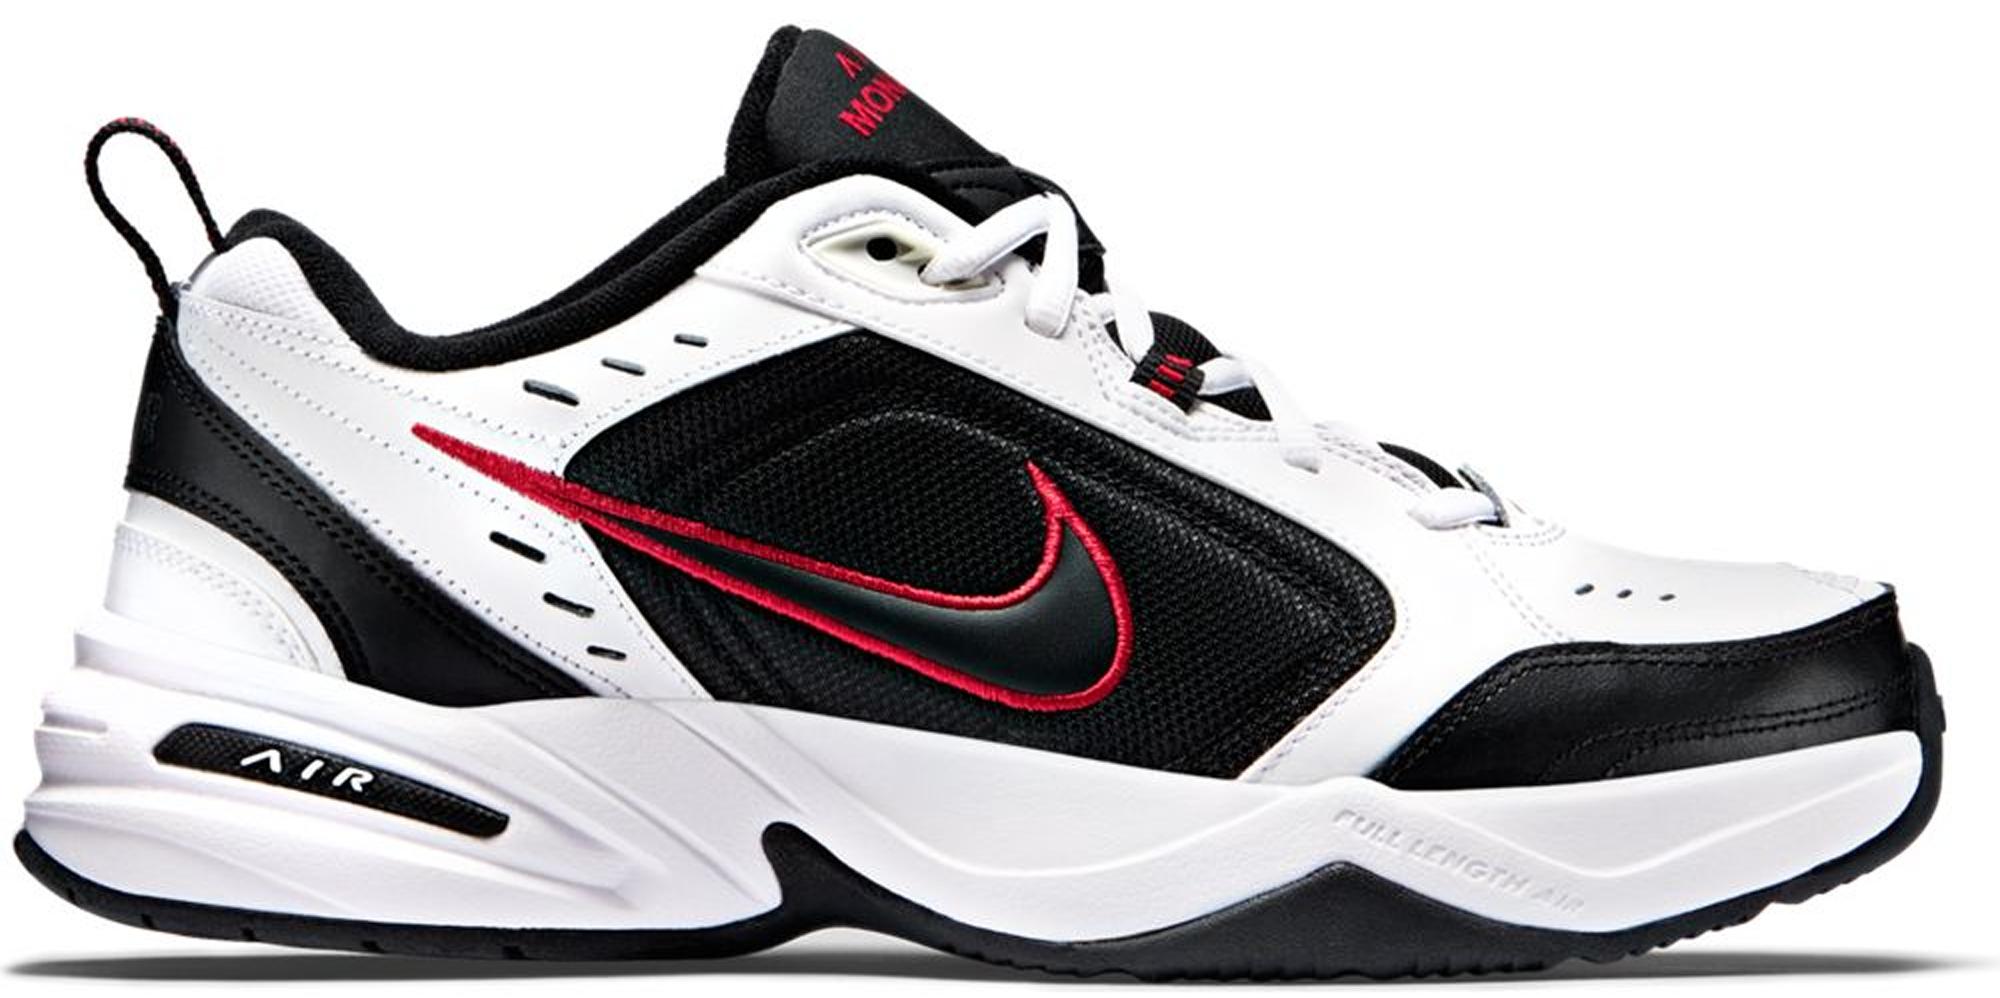 5cb5261613e3 Valentine Air Jordan Shoes